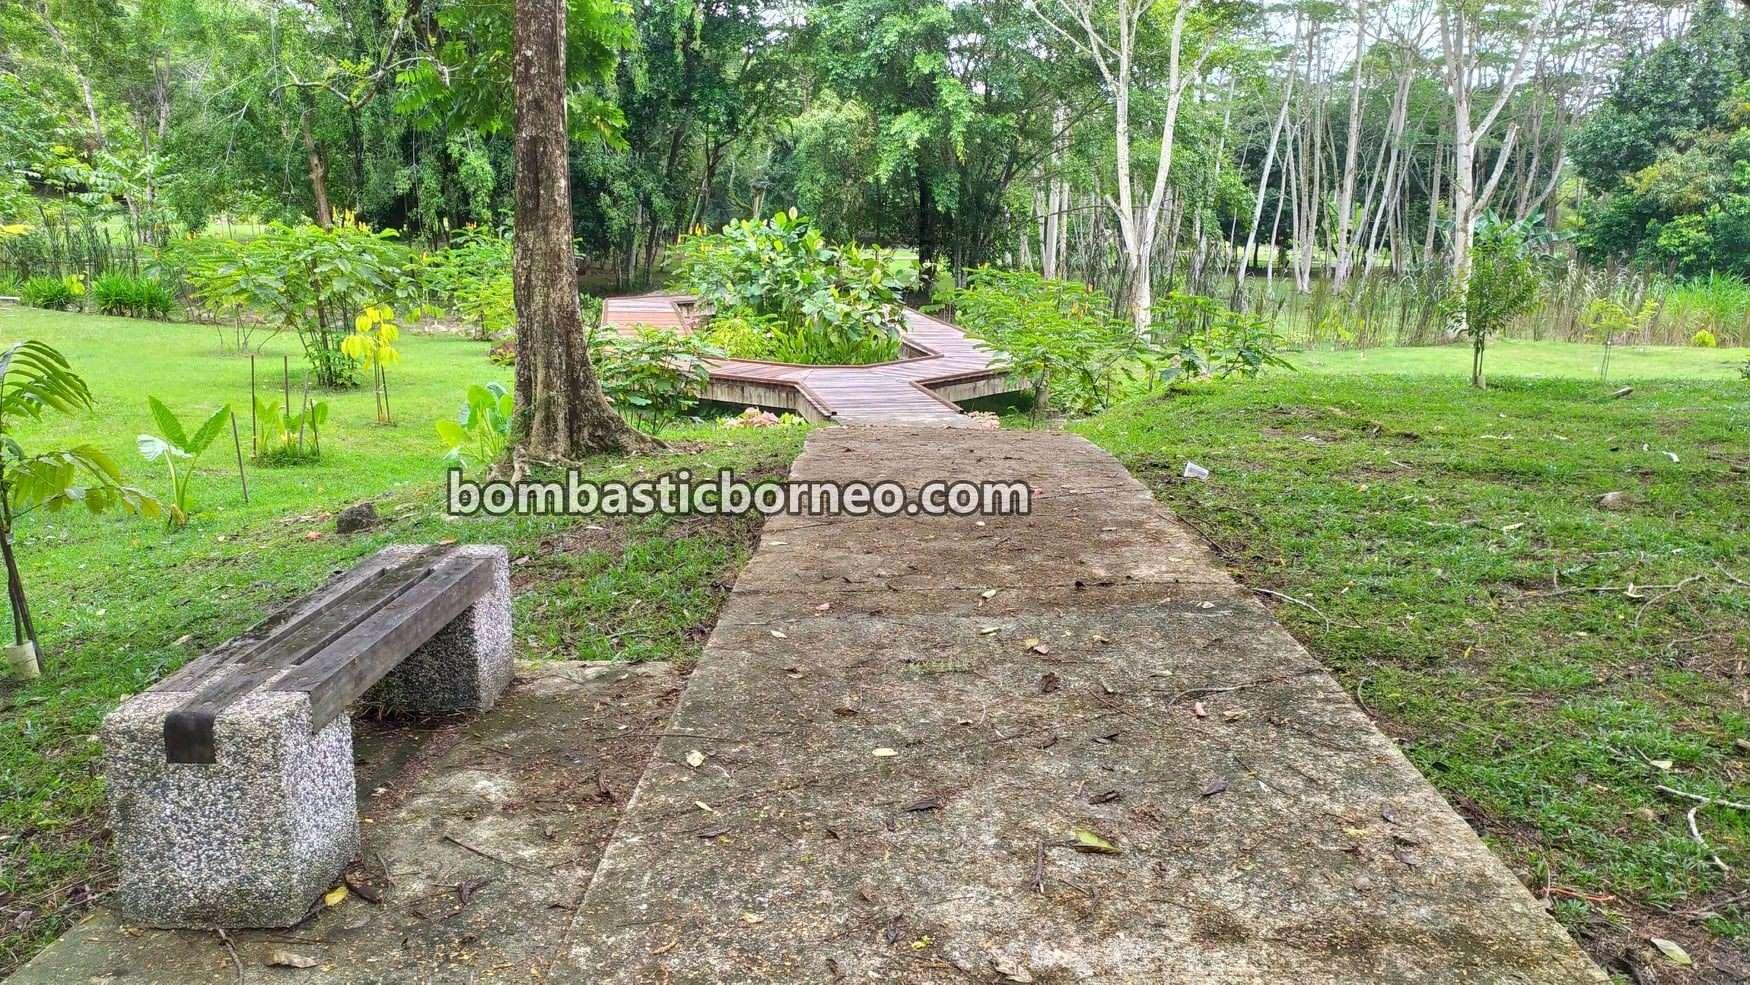 Sarawak Botanical Garden, recreational park, outdoor, exercise, healthy, jogging, walking, nature, Malaysia, Borneo, objek wisata, travel locally, 马来西亚砂拉越, 古晋植物园, 散步运动景点